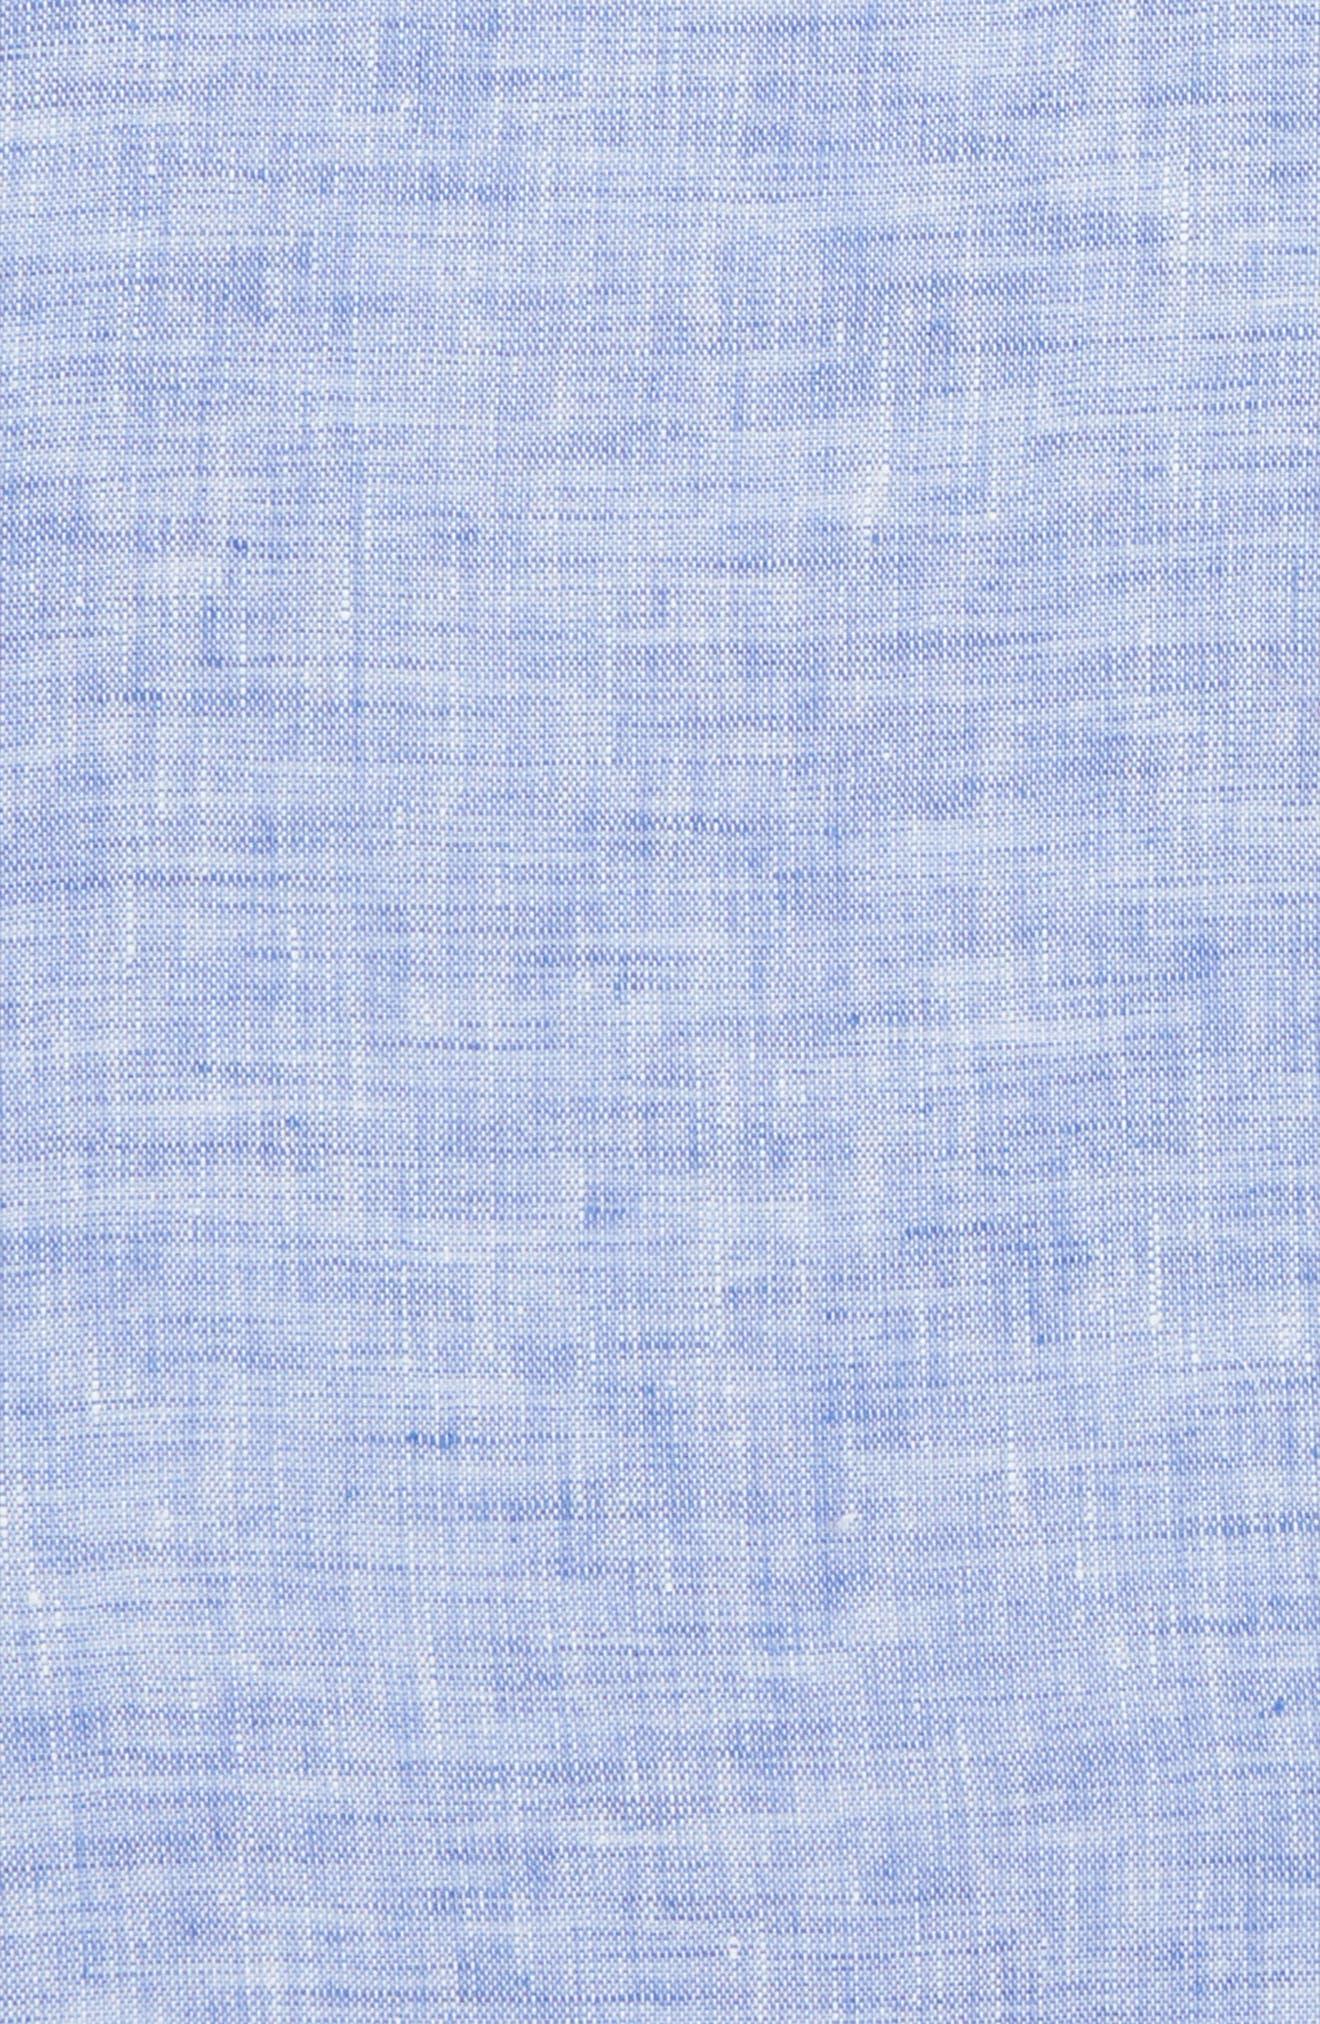 South End Linen Pocket Square,                             Alternate thumbnail 8, color,